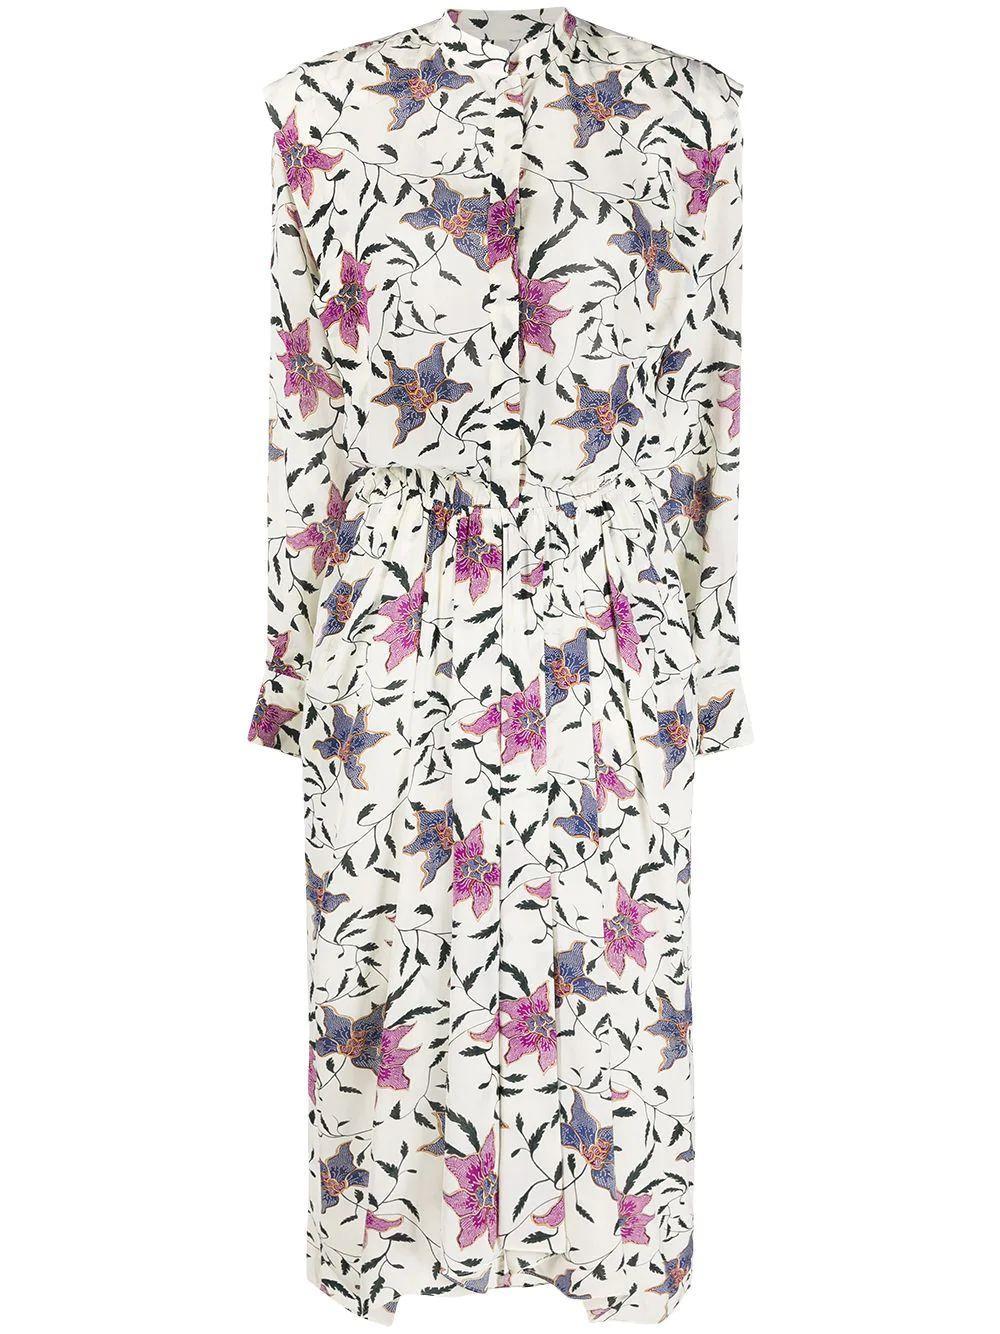 Okley Floral Printed Dress